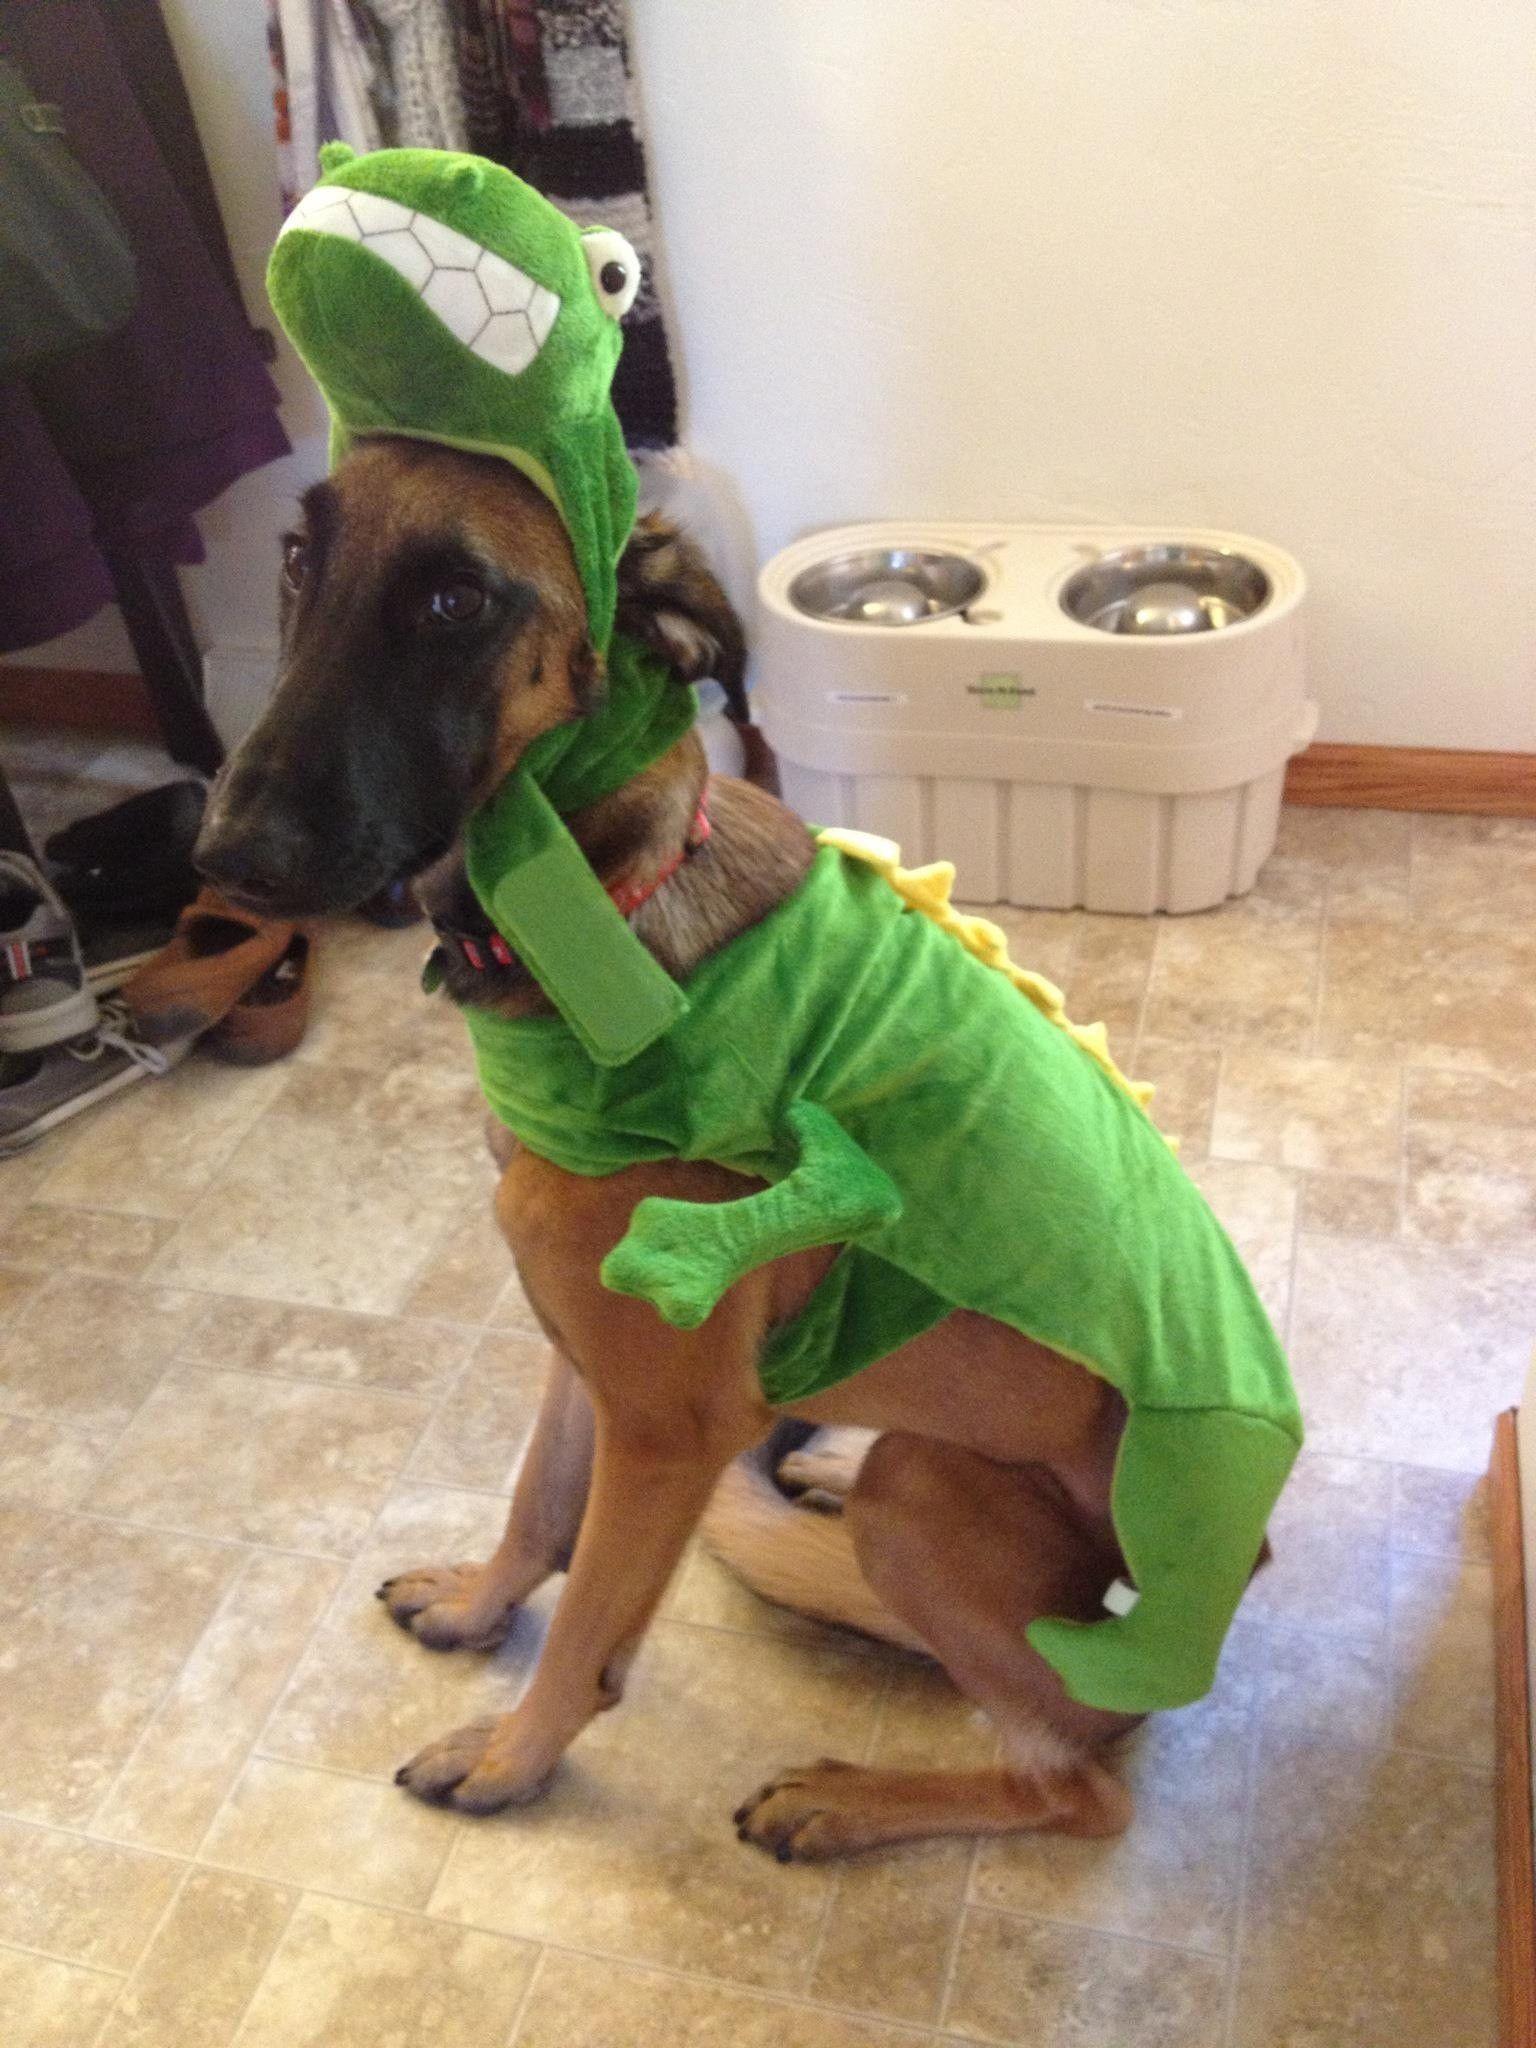 My Belgian Malinois Greyhound Mix In His Halloween Costume 1 Year Old Belgian Malinois Malinois Halloween Costume 1 Year Old